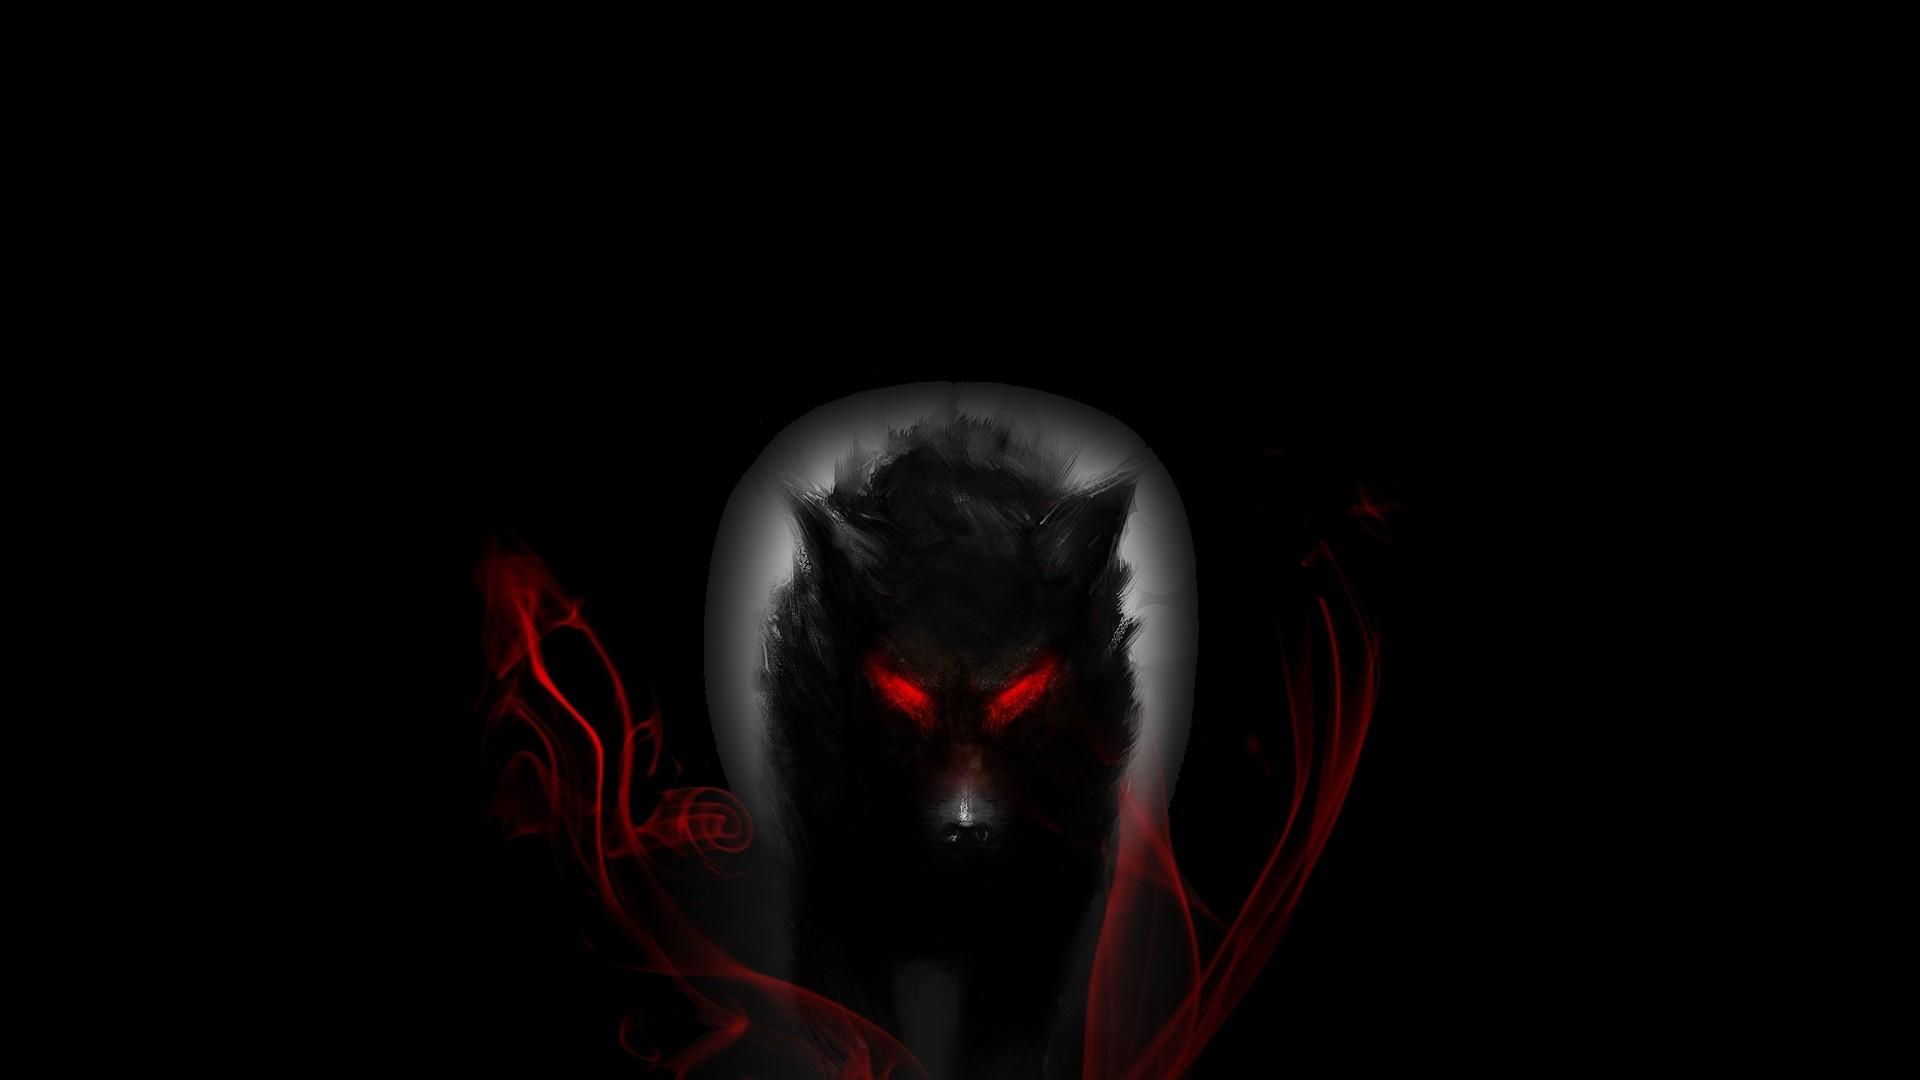 desktop hd evil wolf images desktop hd evil wolf pictures desktop hd .